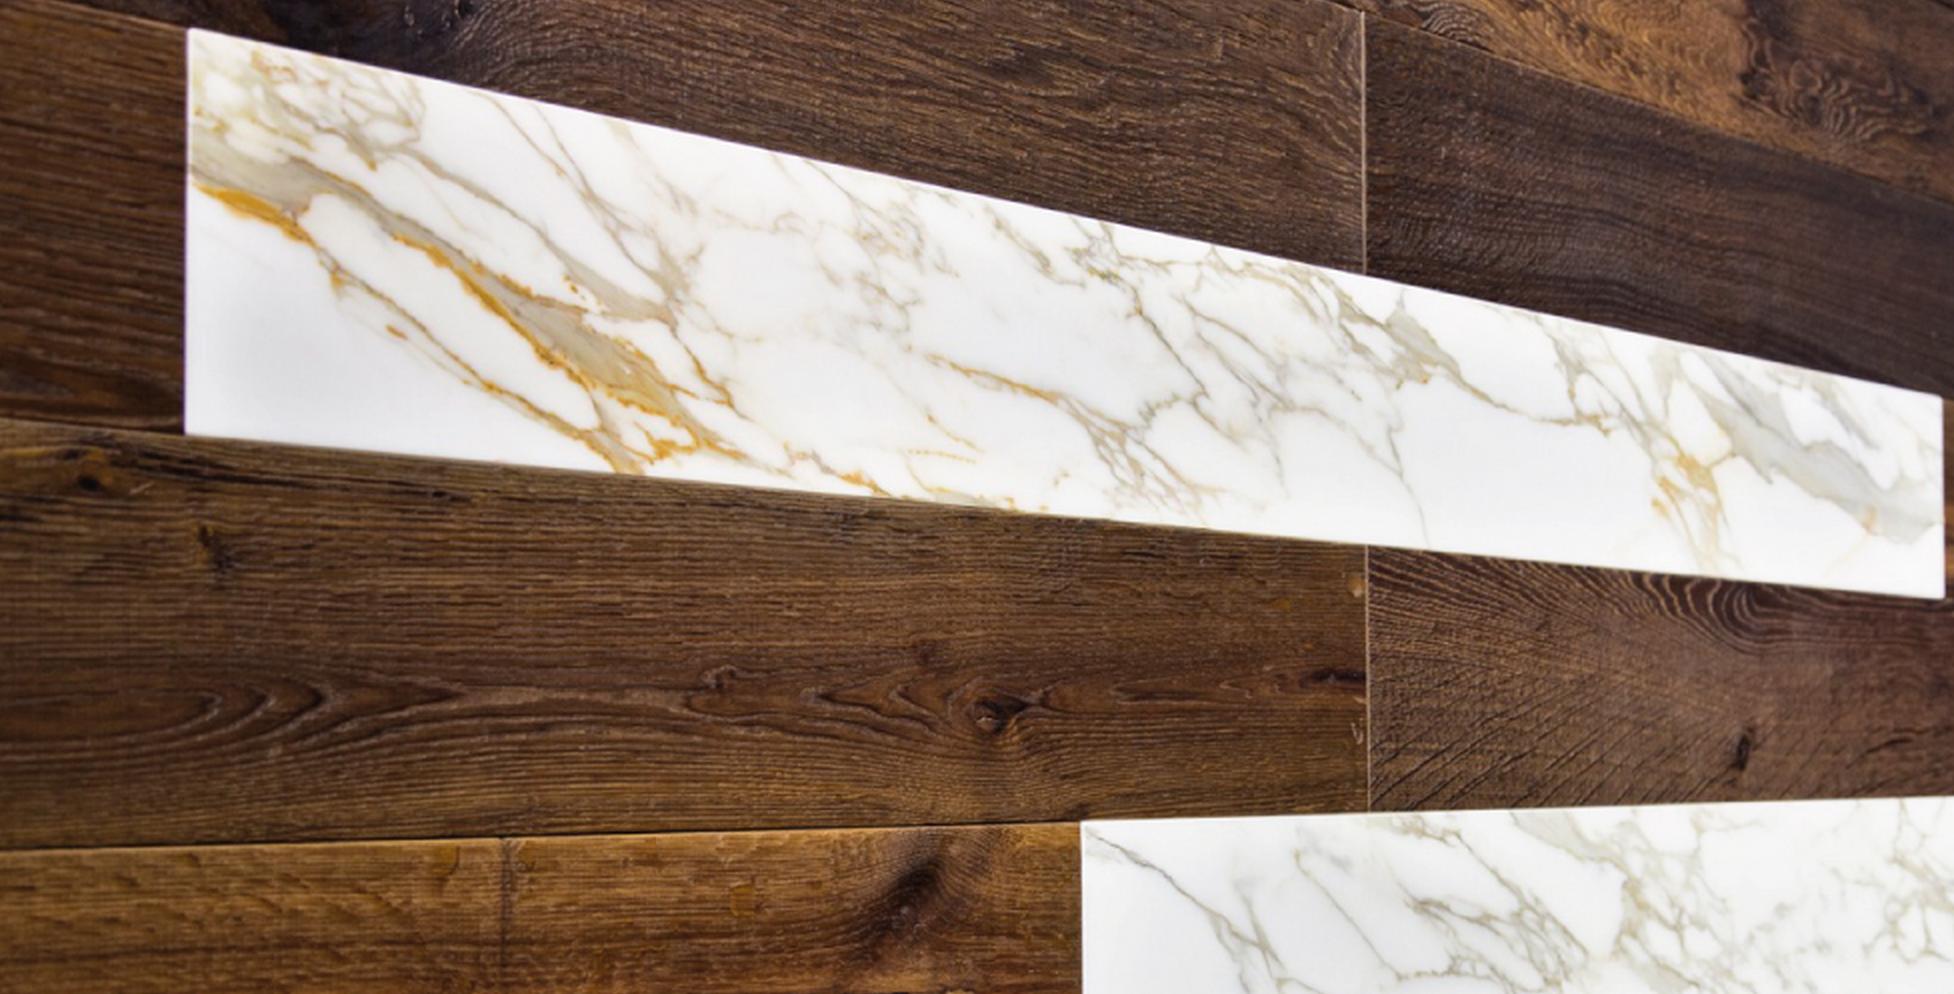 Dedalo stone marble and wood feature - Masha Shapiro Agency.png